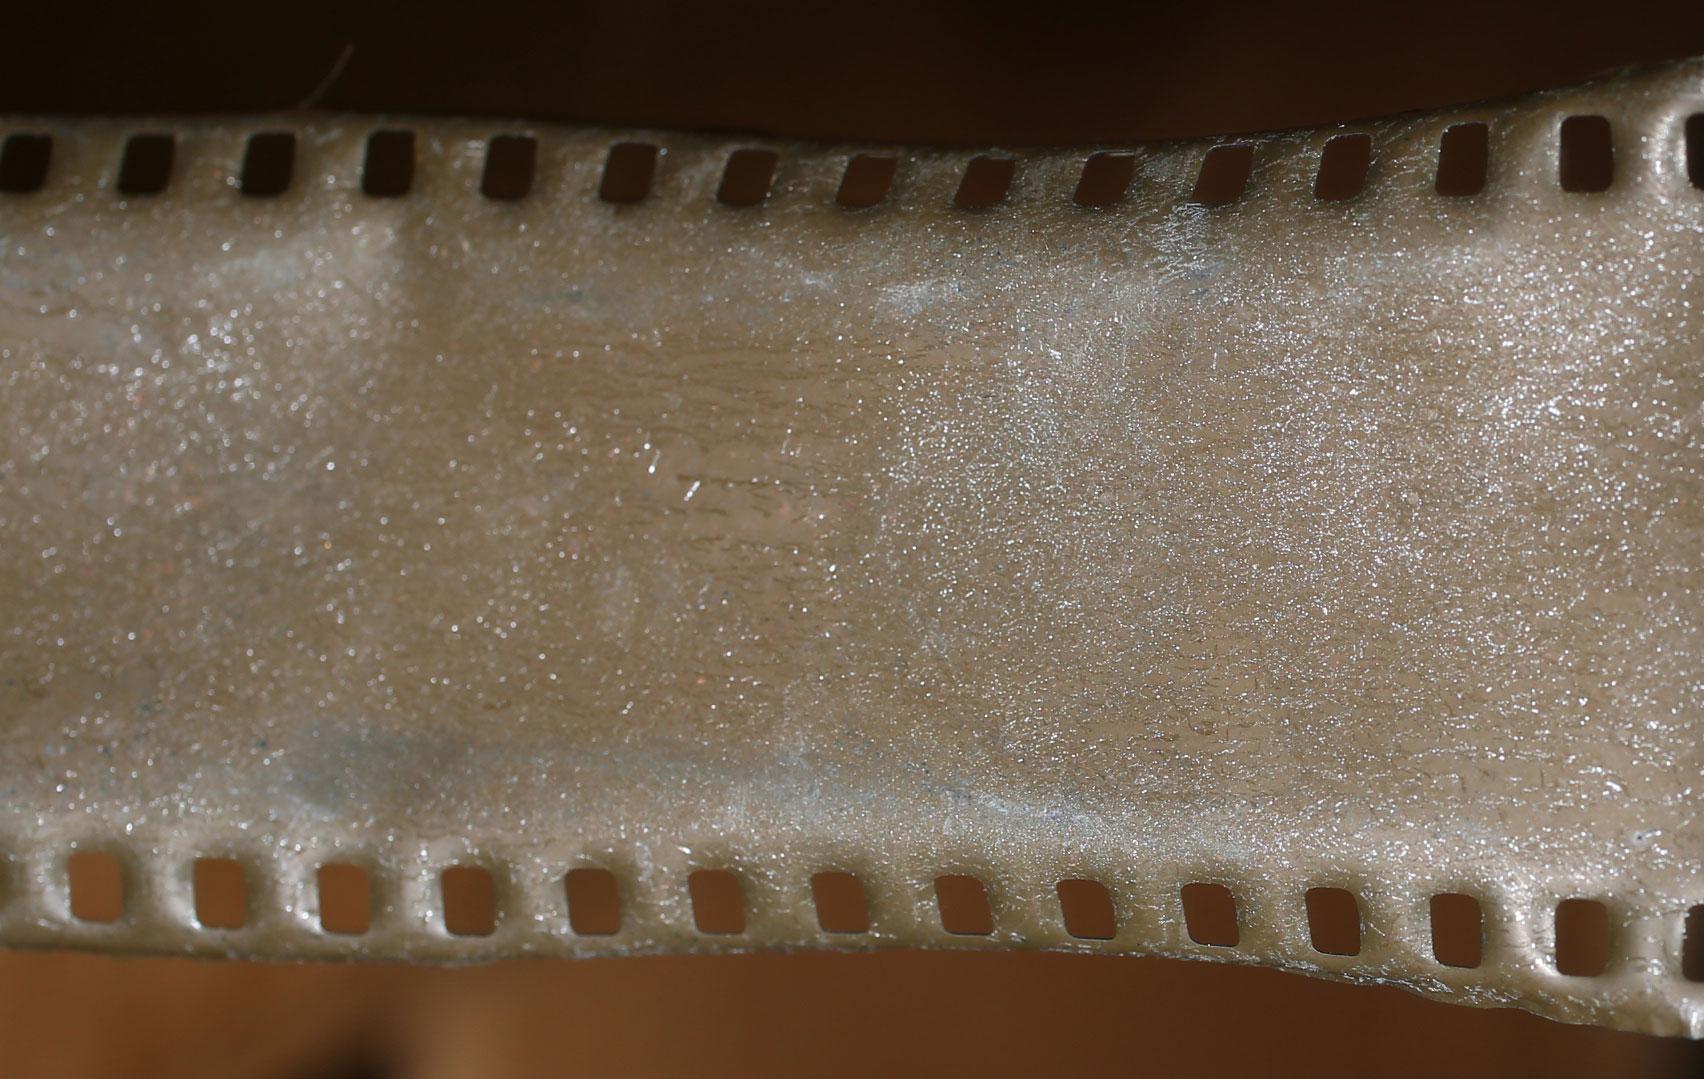 Dirty-film-example-2.jpg